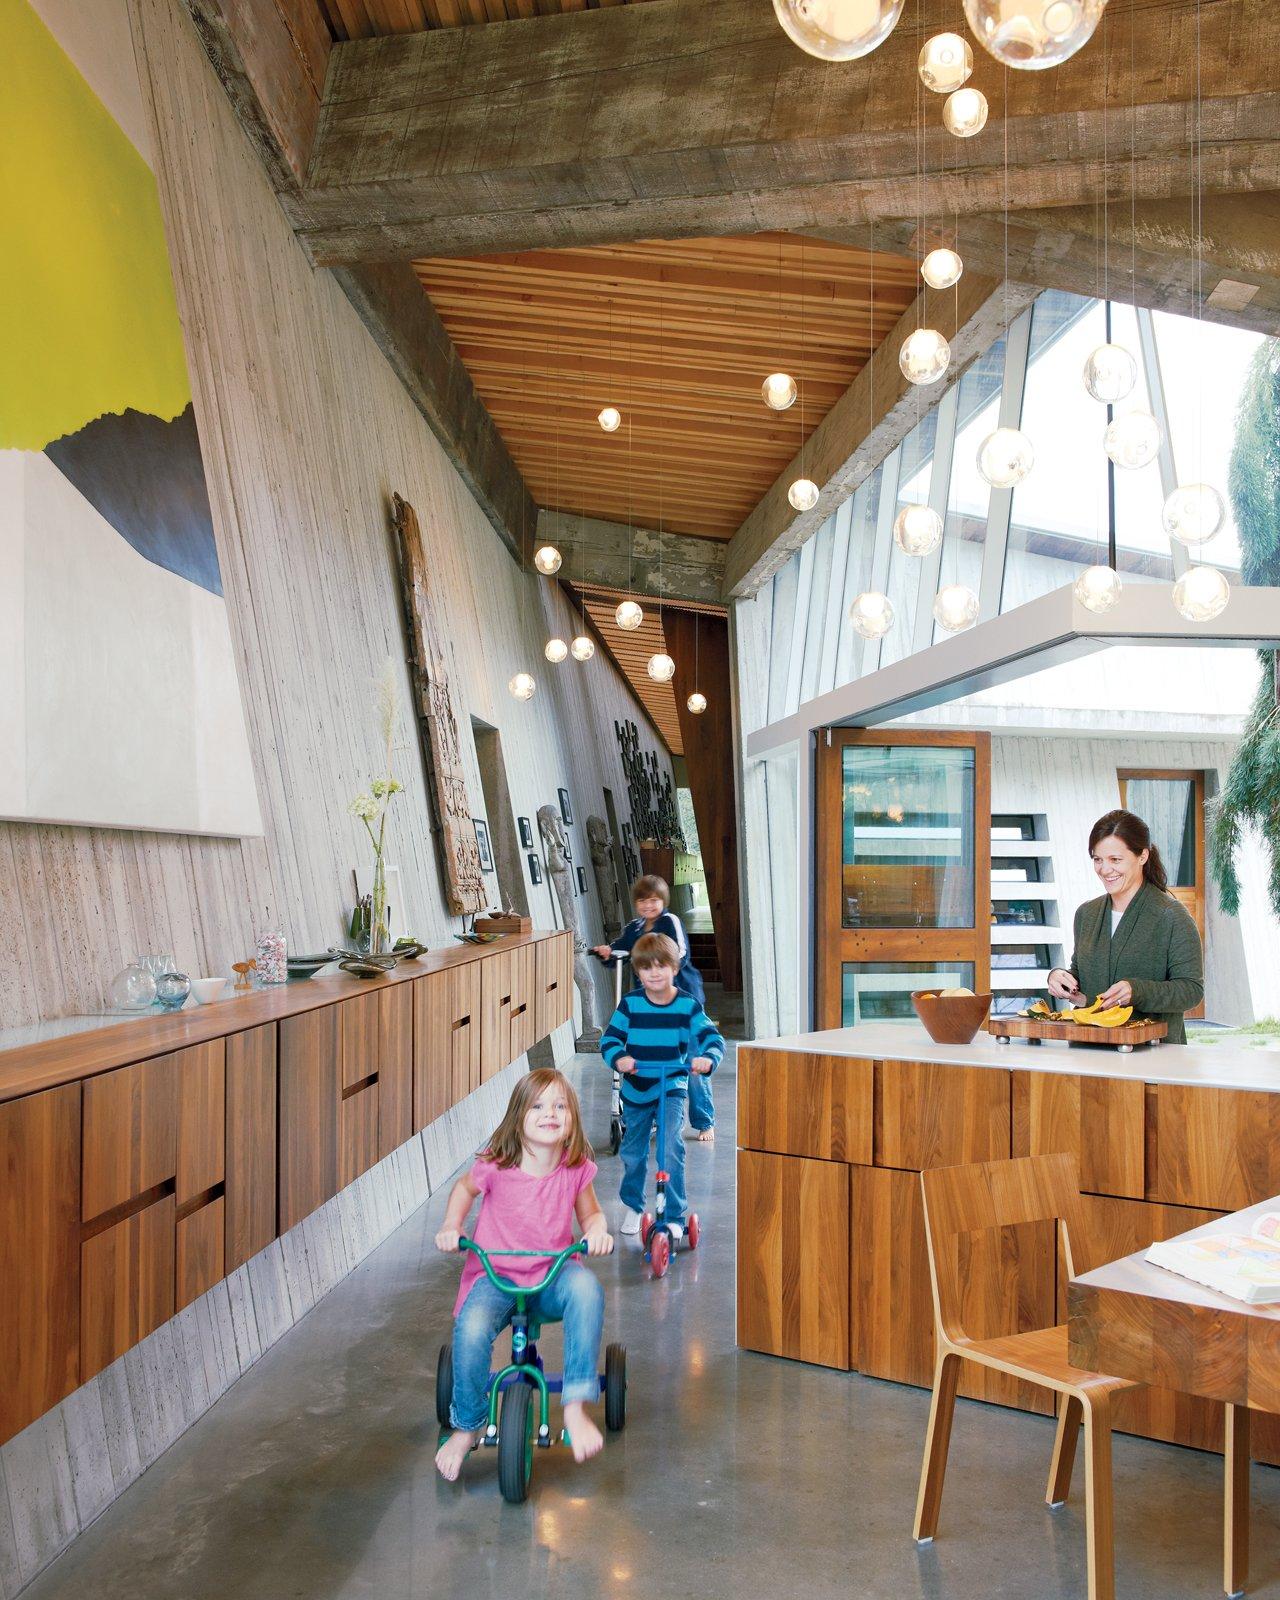 top omer arbel. Top Omer Arbel. Arbel Kitchen Wood Cabinet Concrete Floor And Pendant Lighting The